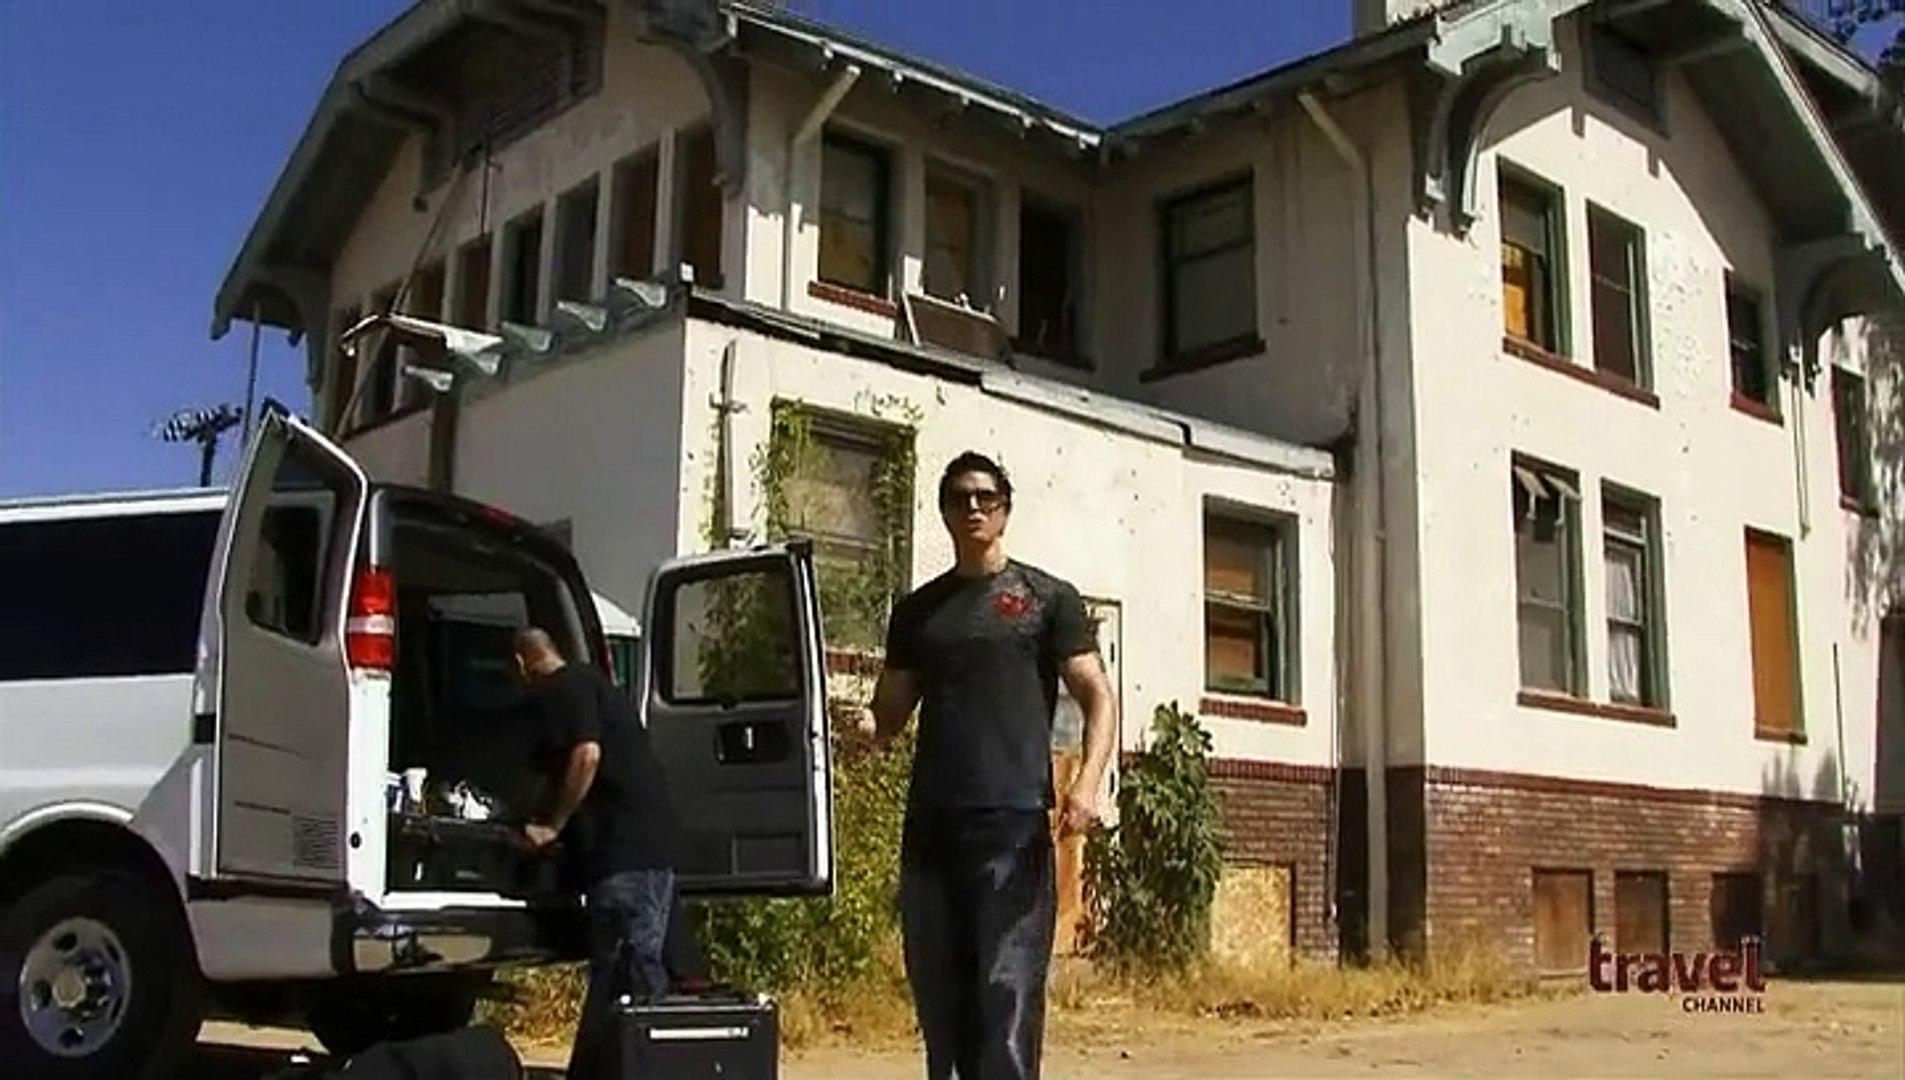 Ghost Adventures S03E10 - Clovis Wolfe Manor